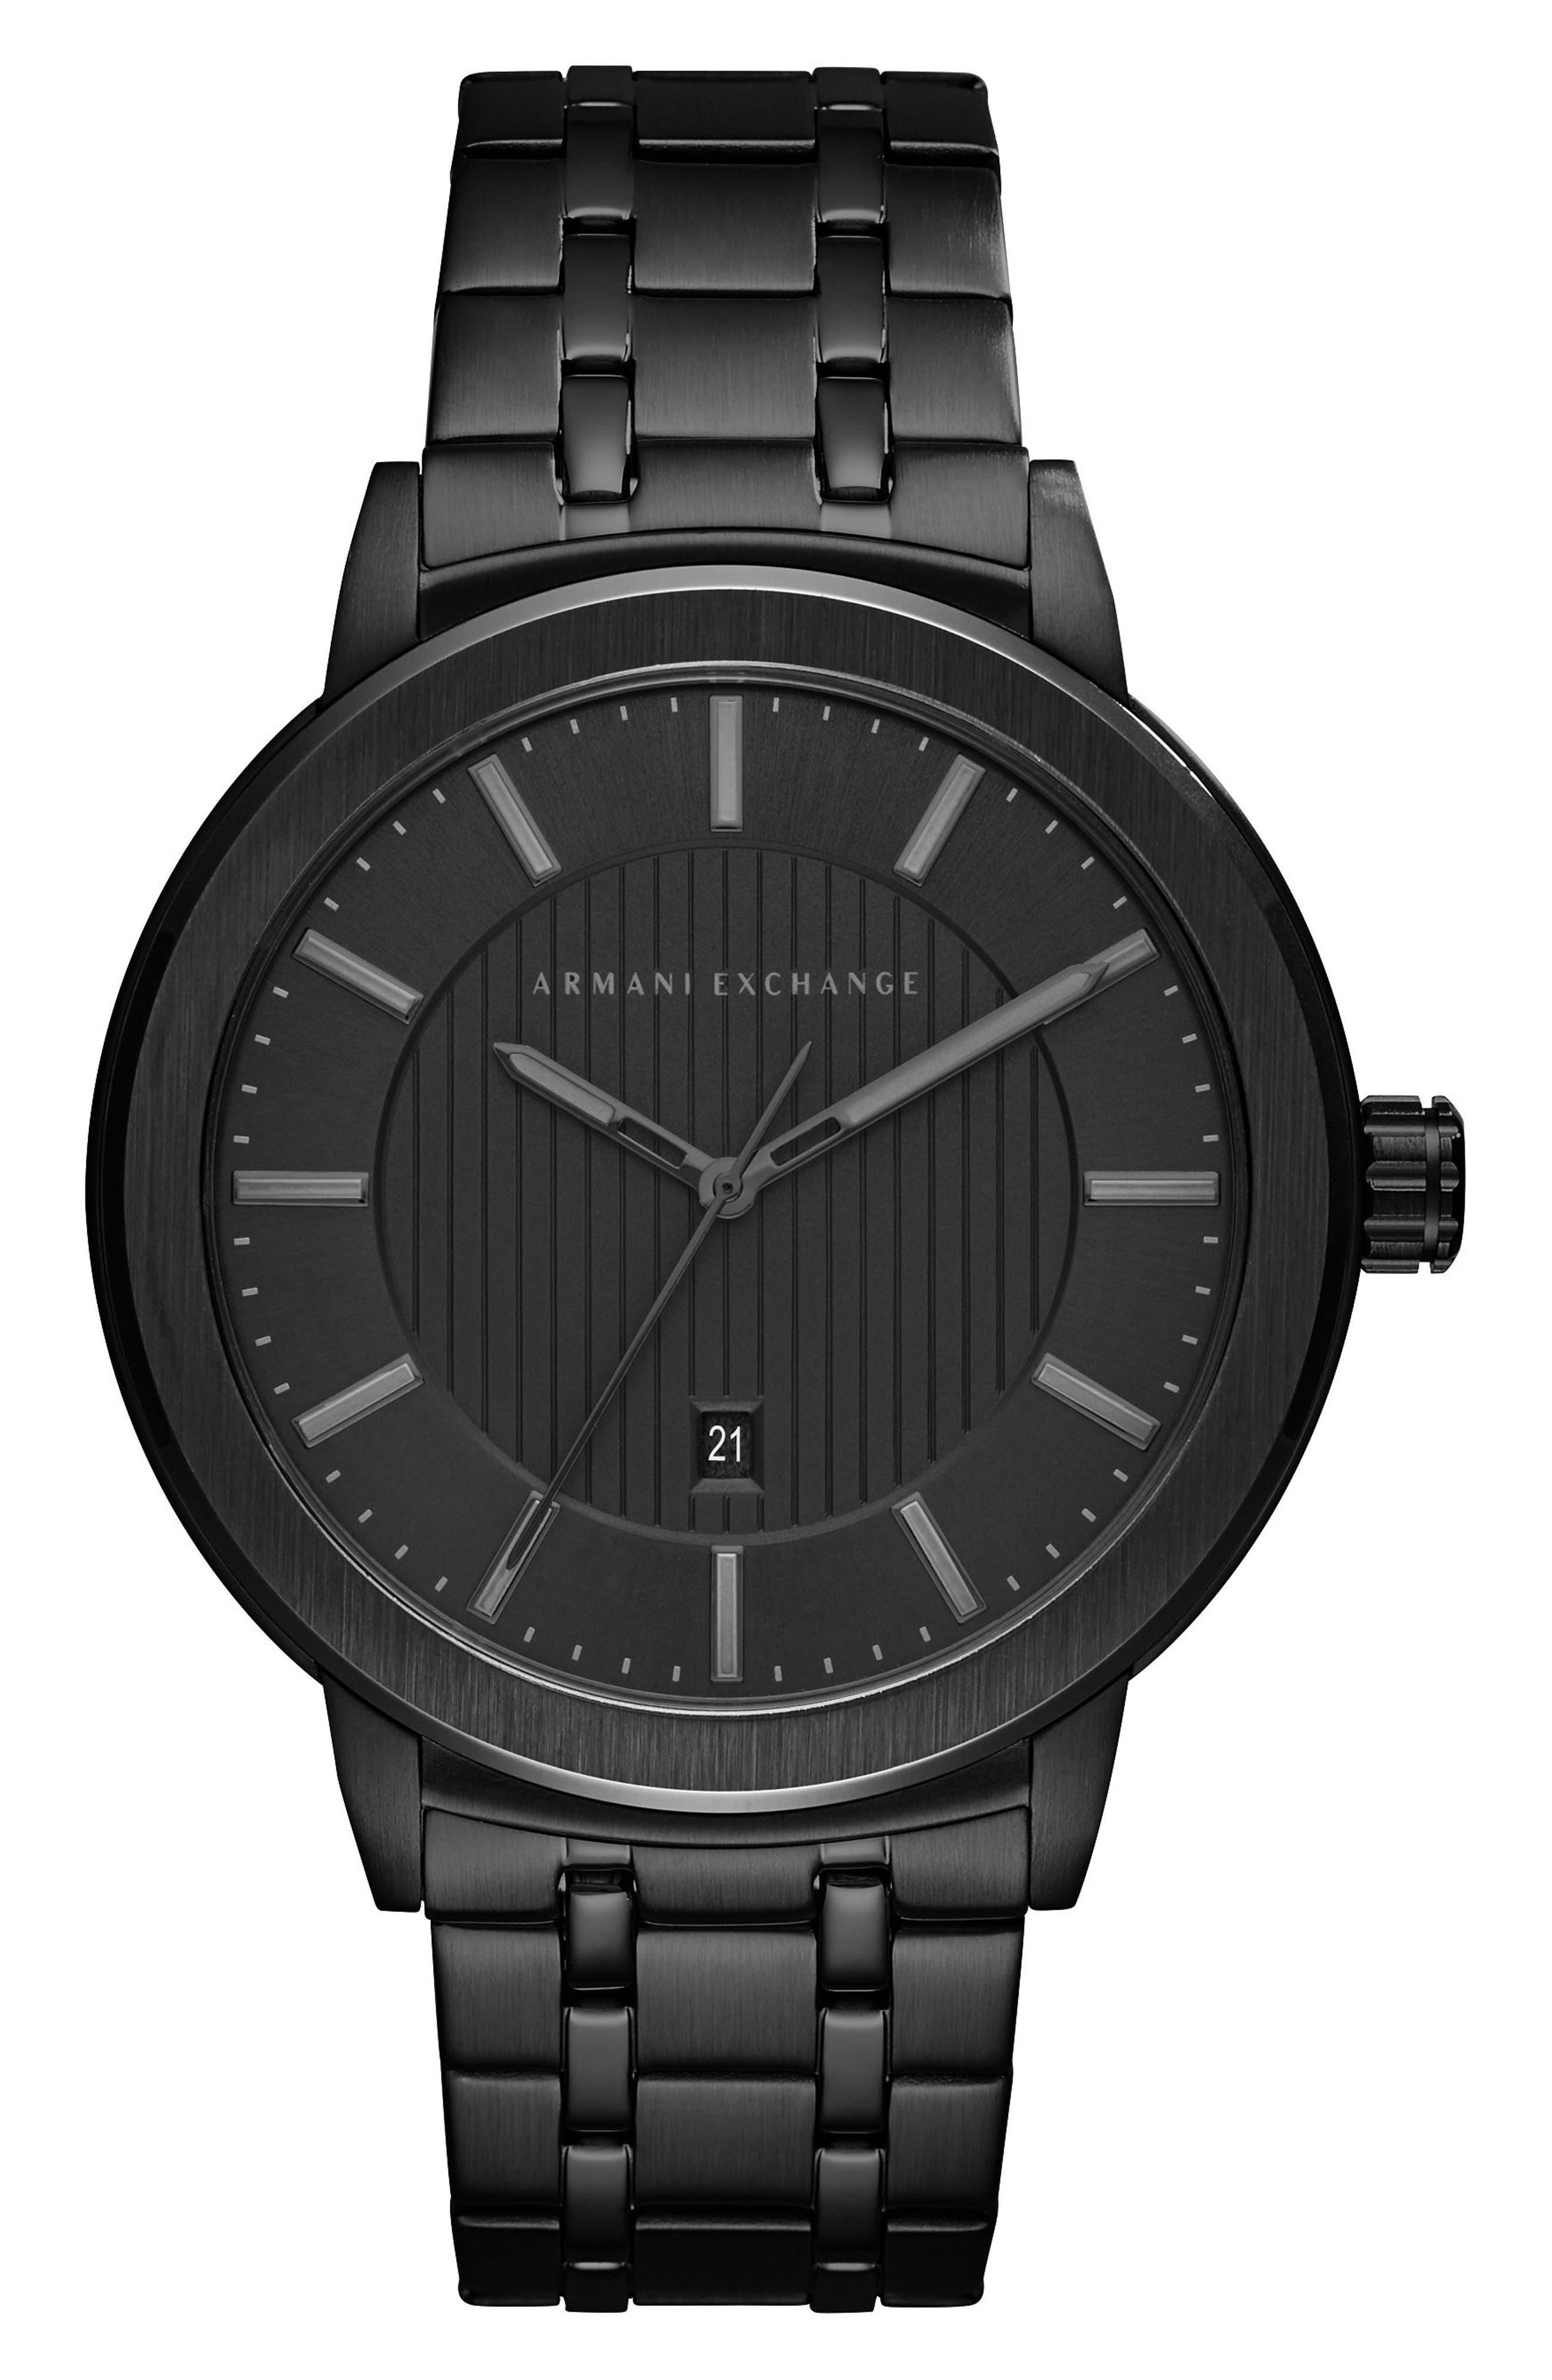 AX ARMANI EXCHANGE Bracelet Strap Watch, 46mm, Main, color, BLACK/ BLACK